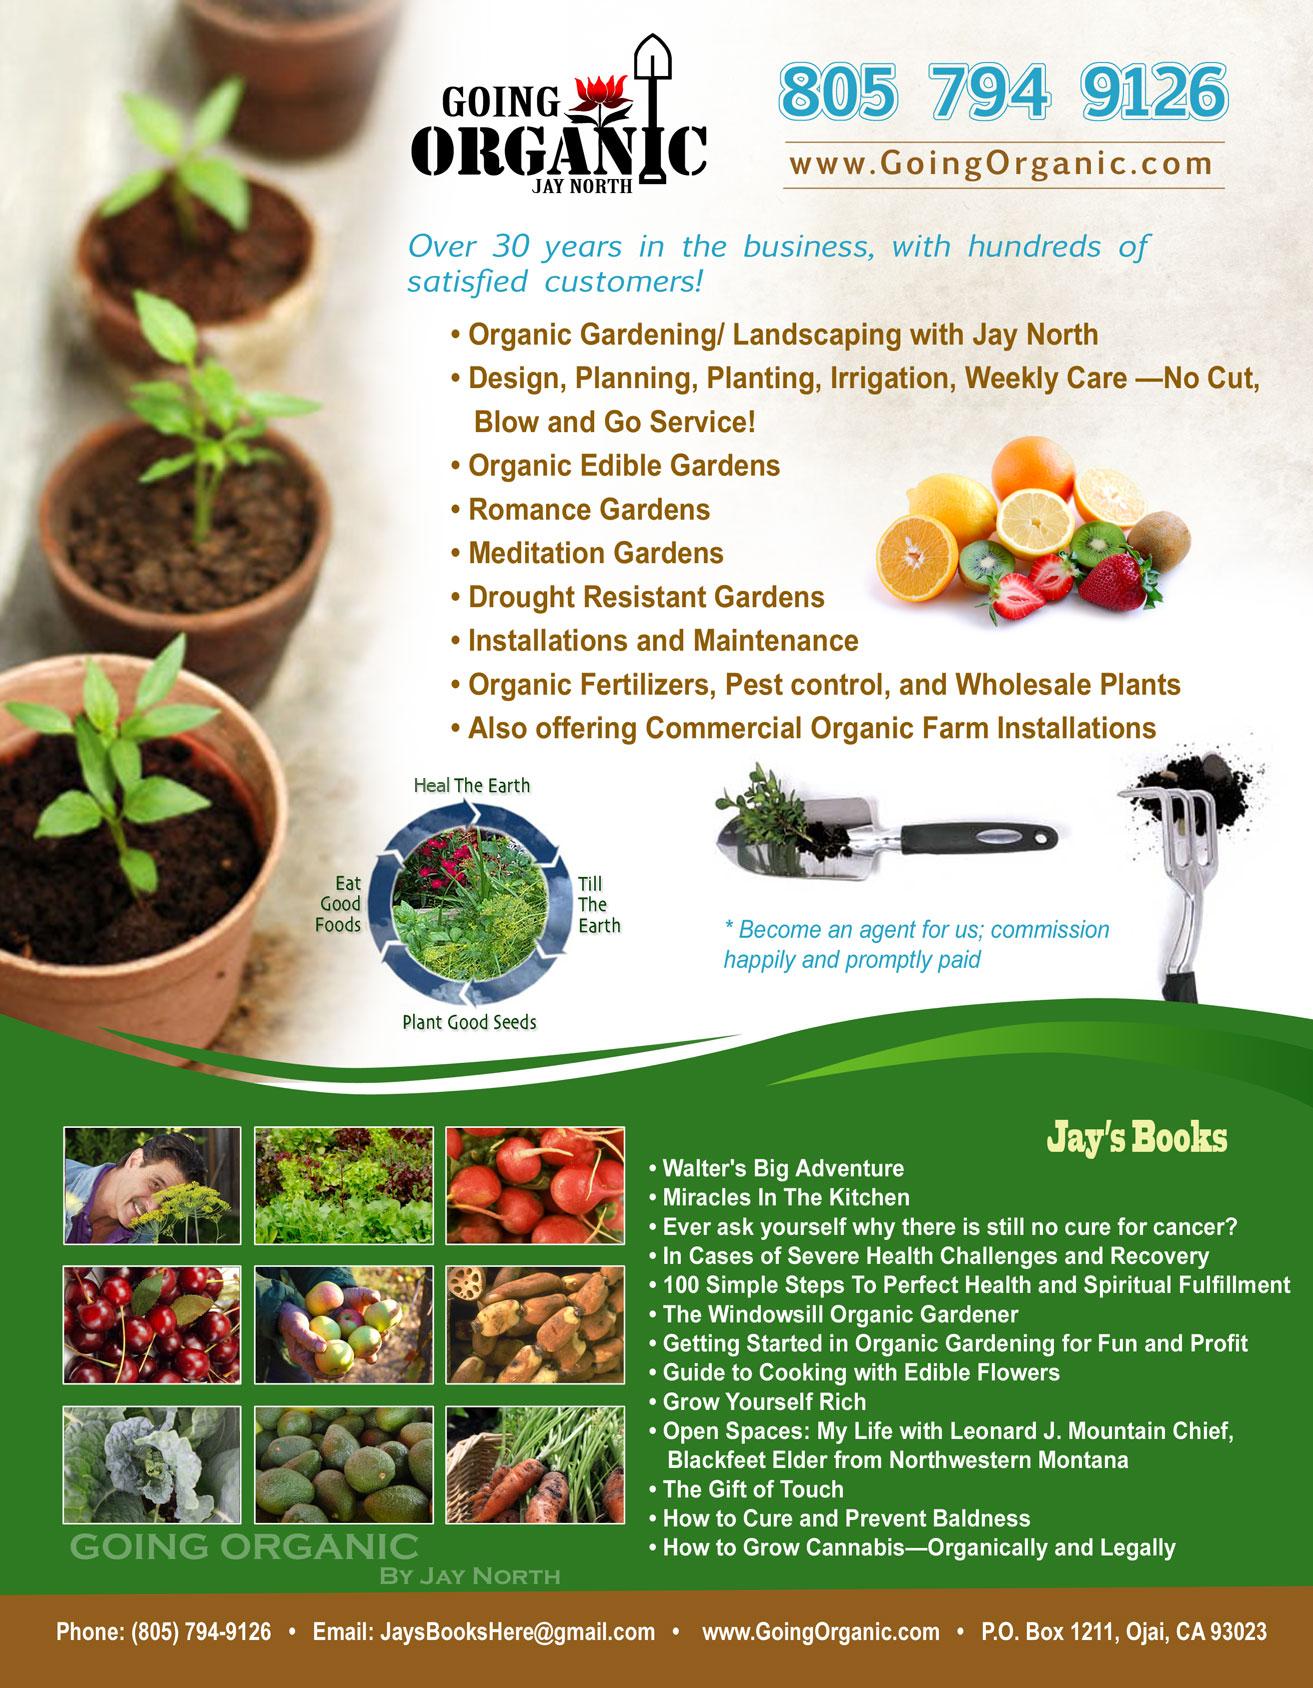 goingorganic com organic gardening made easy